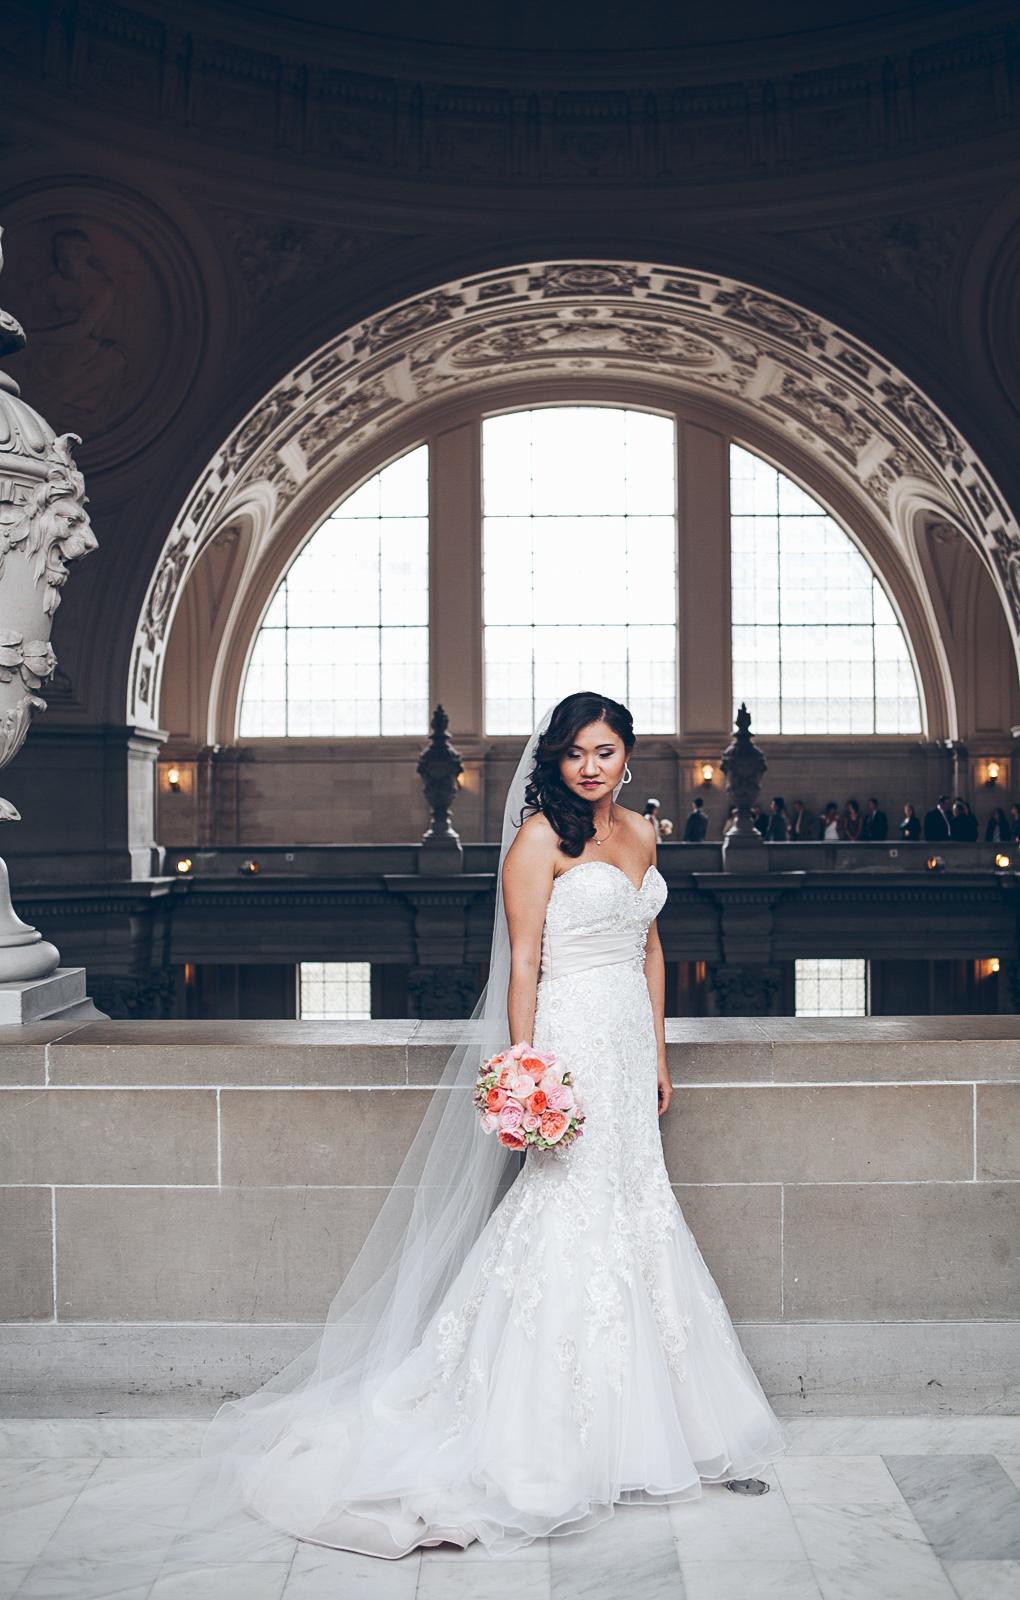 San_francisco_city_hall_wedding_photography_meegan_travis_ebony_siovhan_bokeh_photography_31.jpg